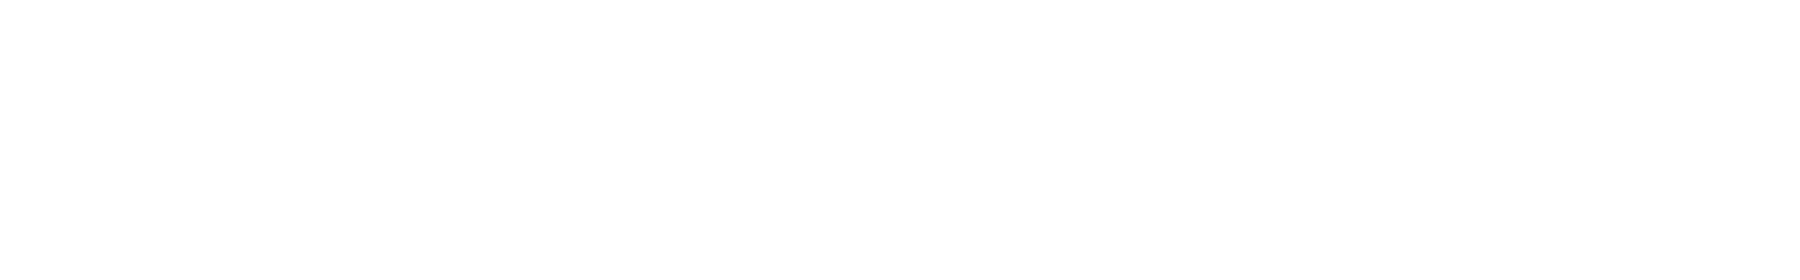 vedh bass cut 046 g